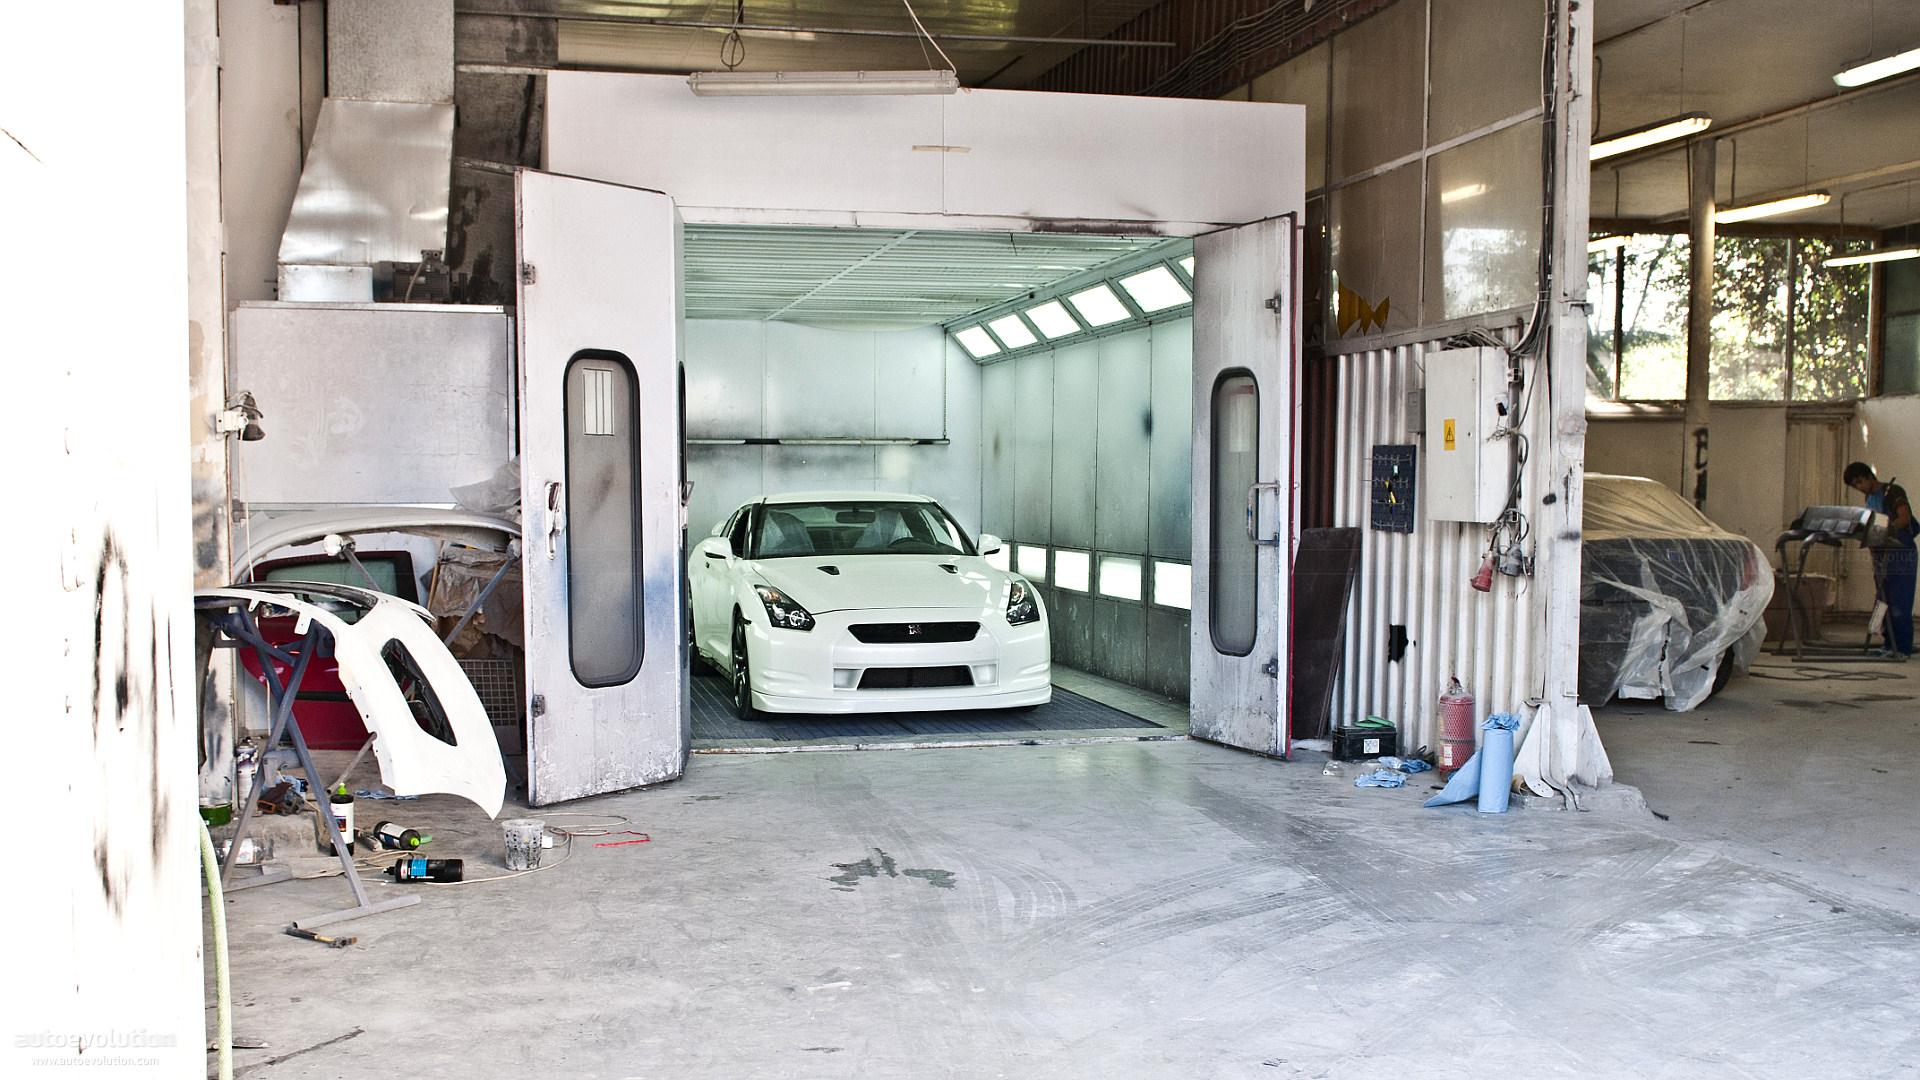 Painted Garage Walls Ideas